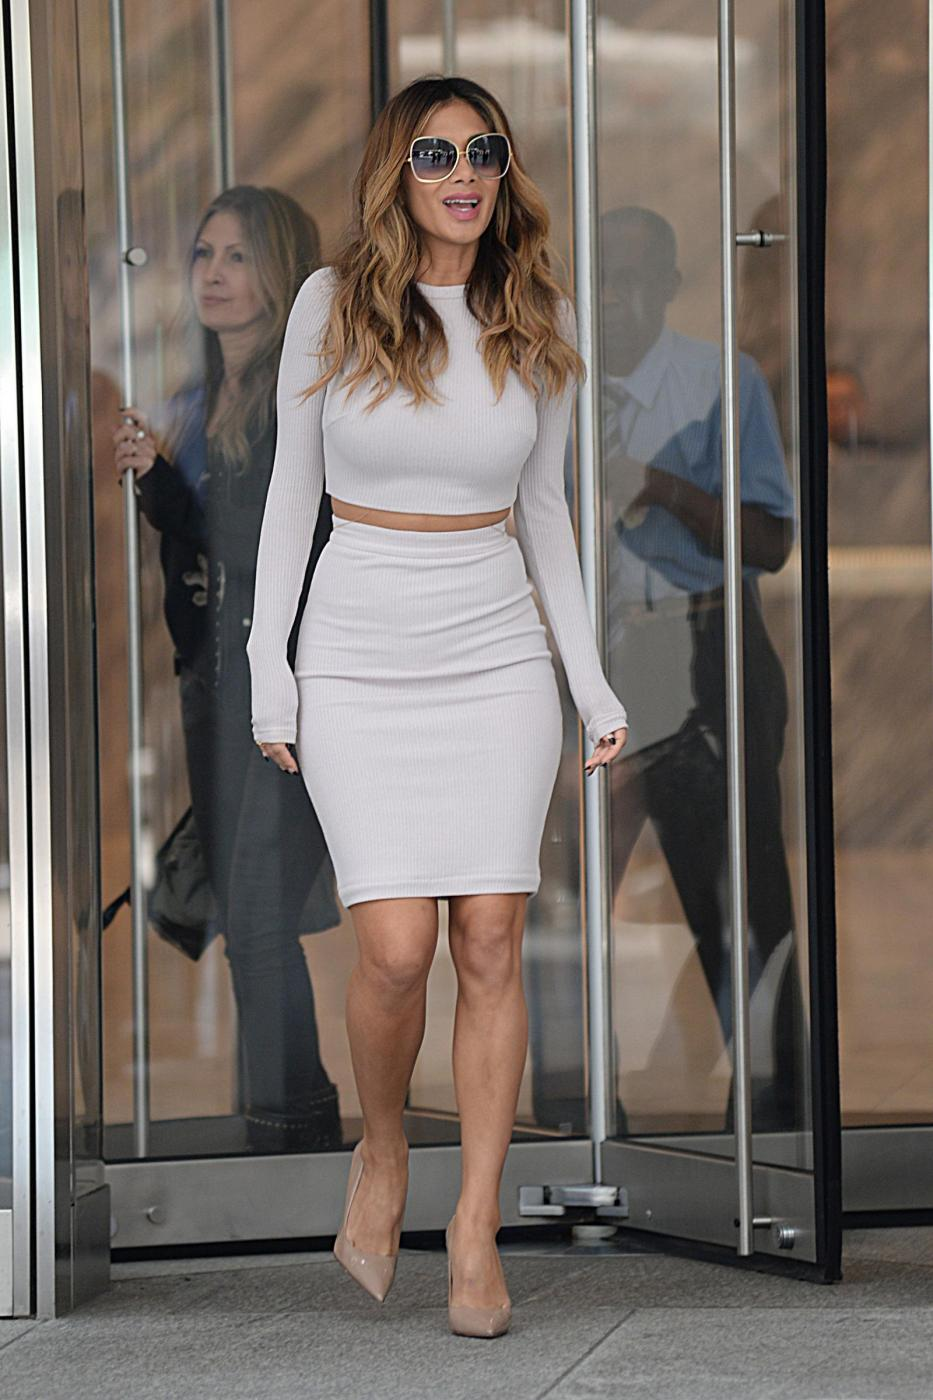 Nicole Scherzinger sempre più curvy e...bionda. Abiti super aderenti a New York FOTO 59